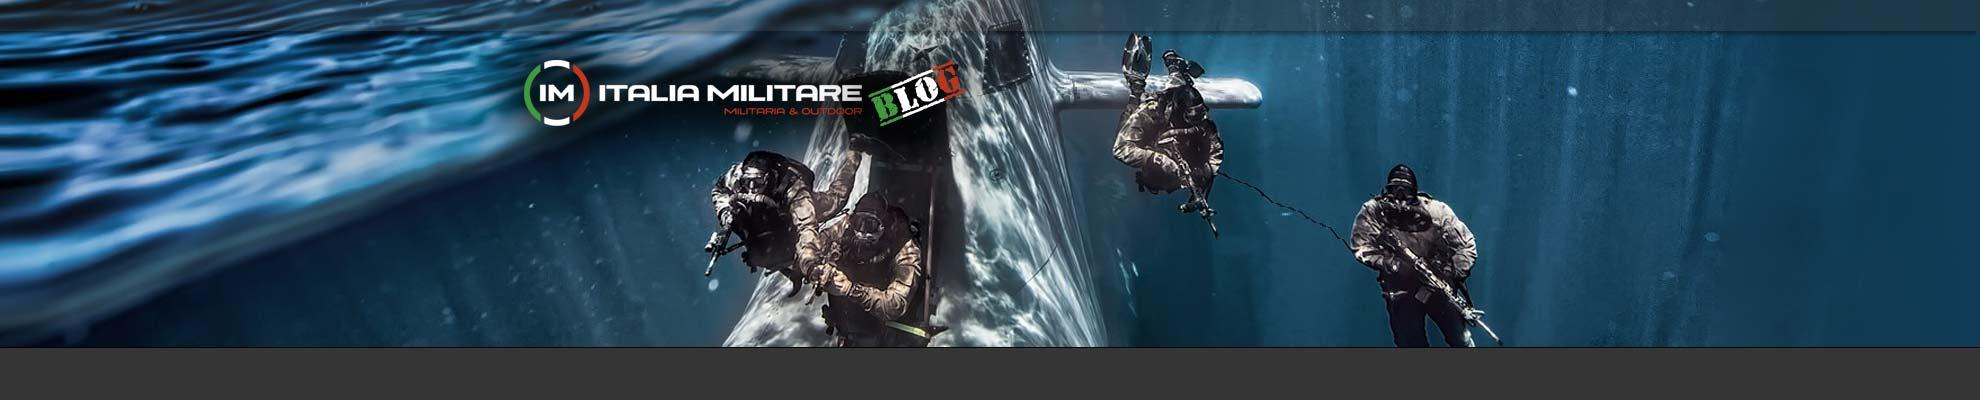 marina-militare-goi-banner-5